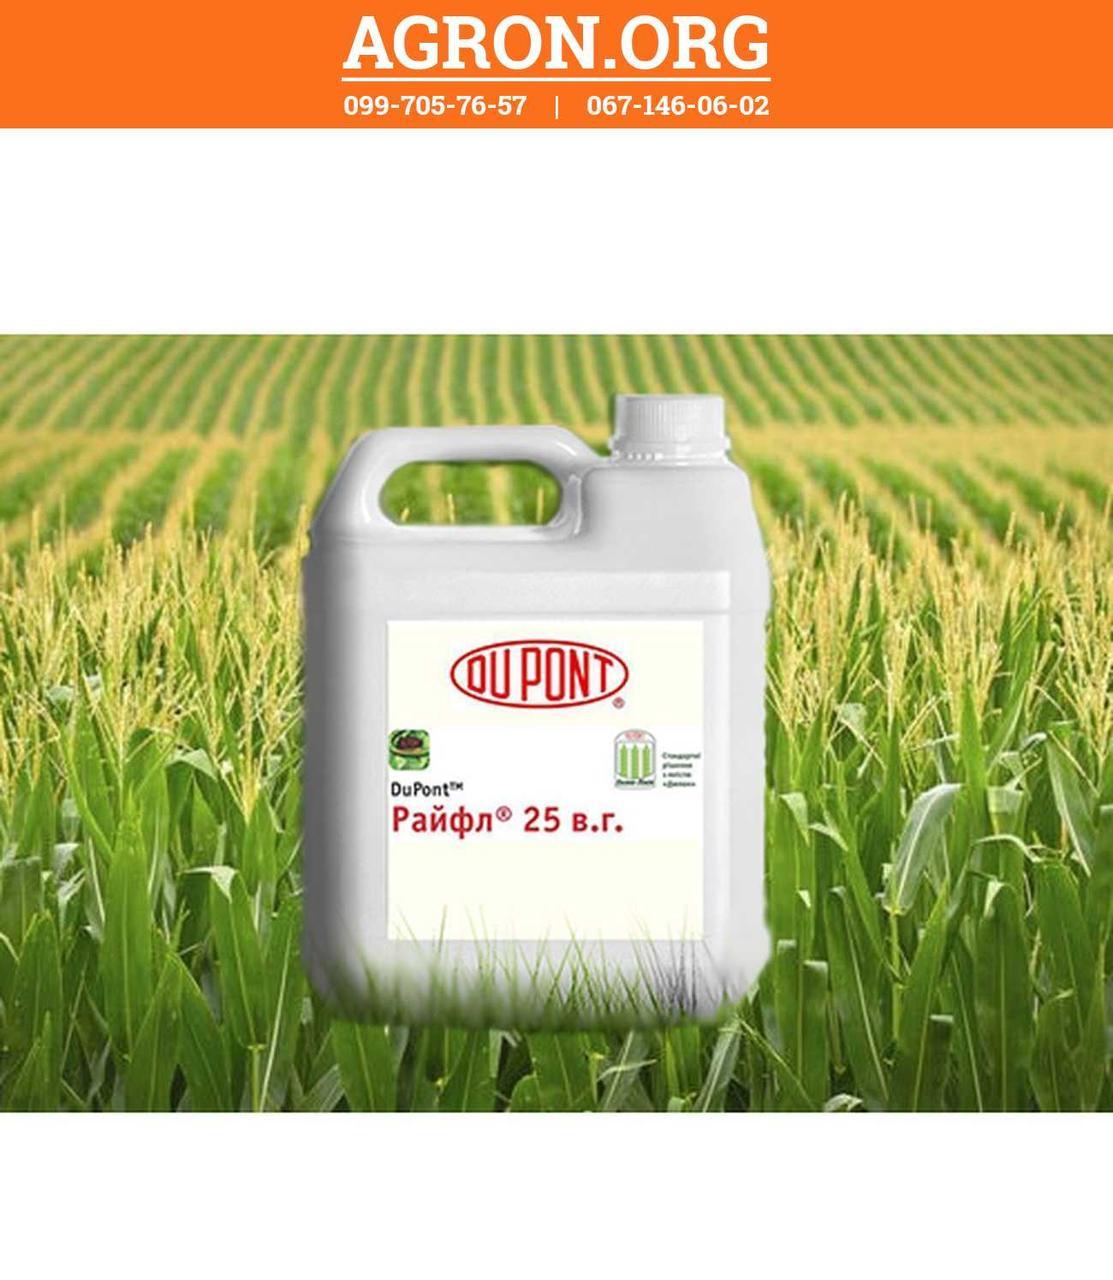 Райфл гербицид для захисту кукурудзи DuPont 0,5 кг